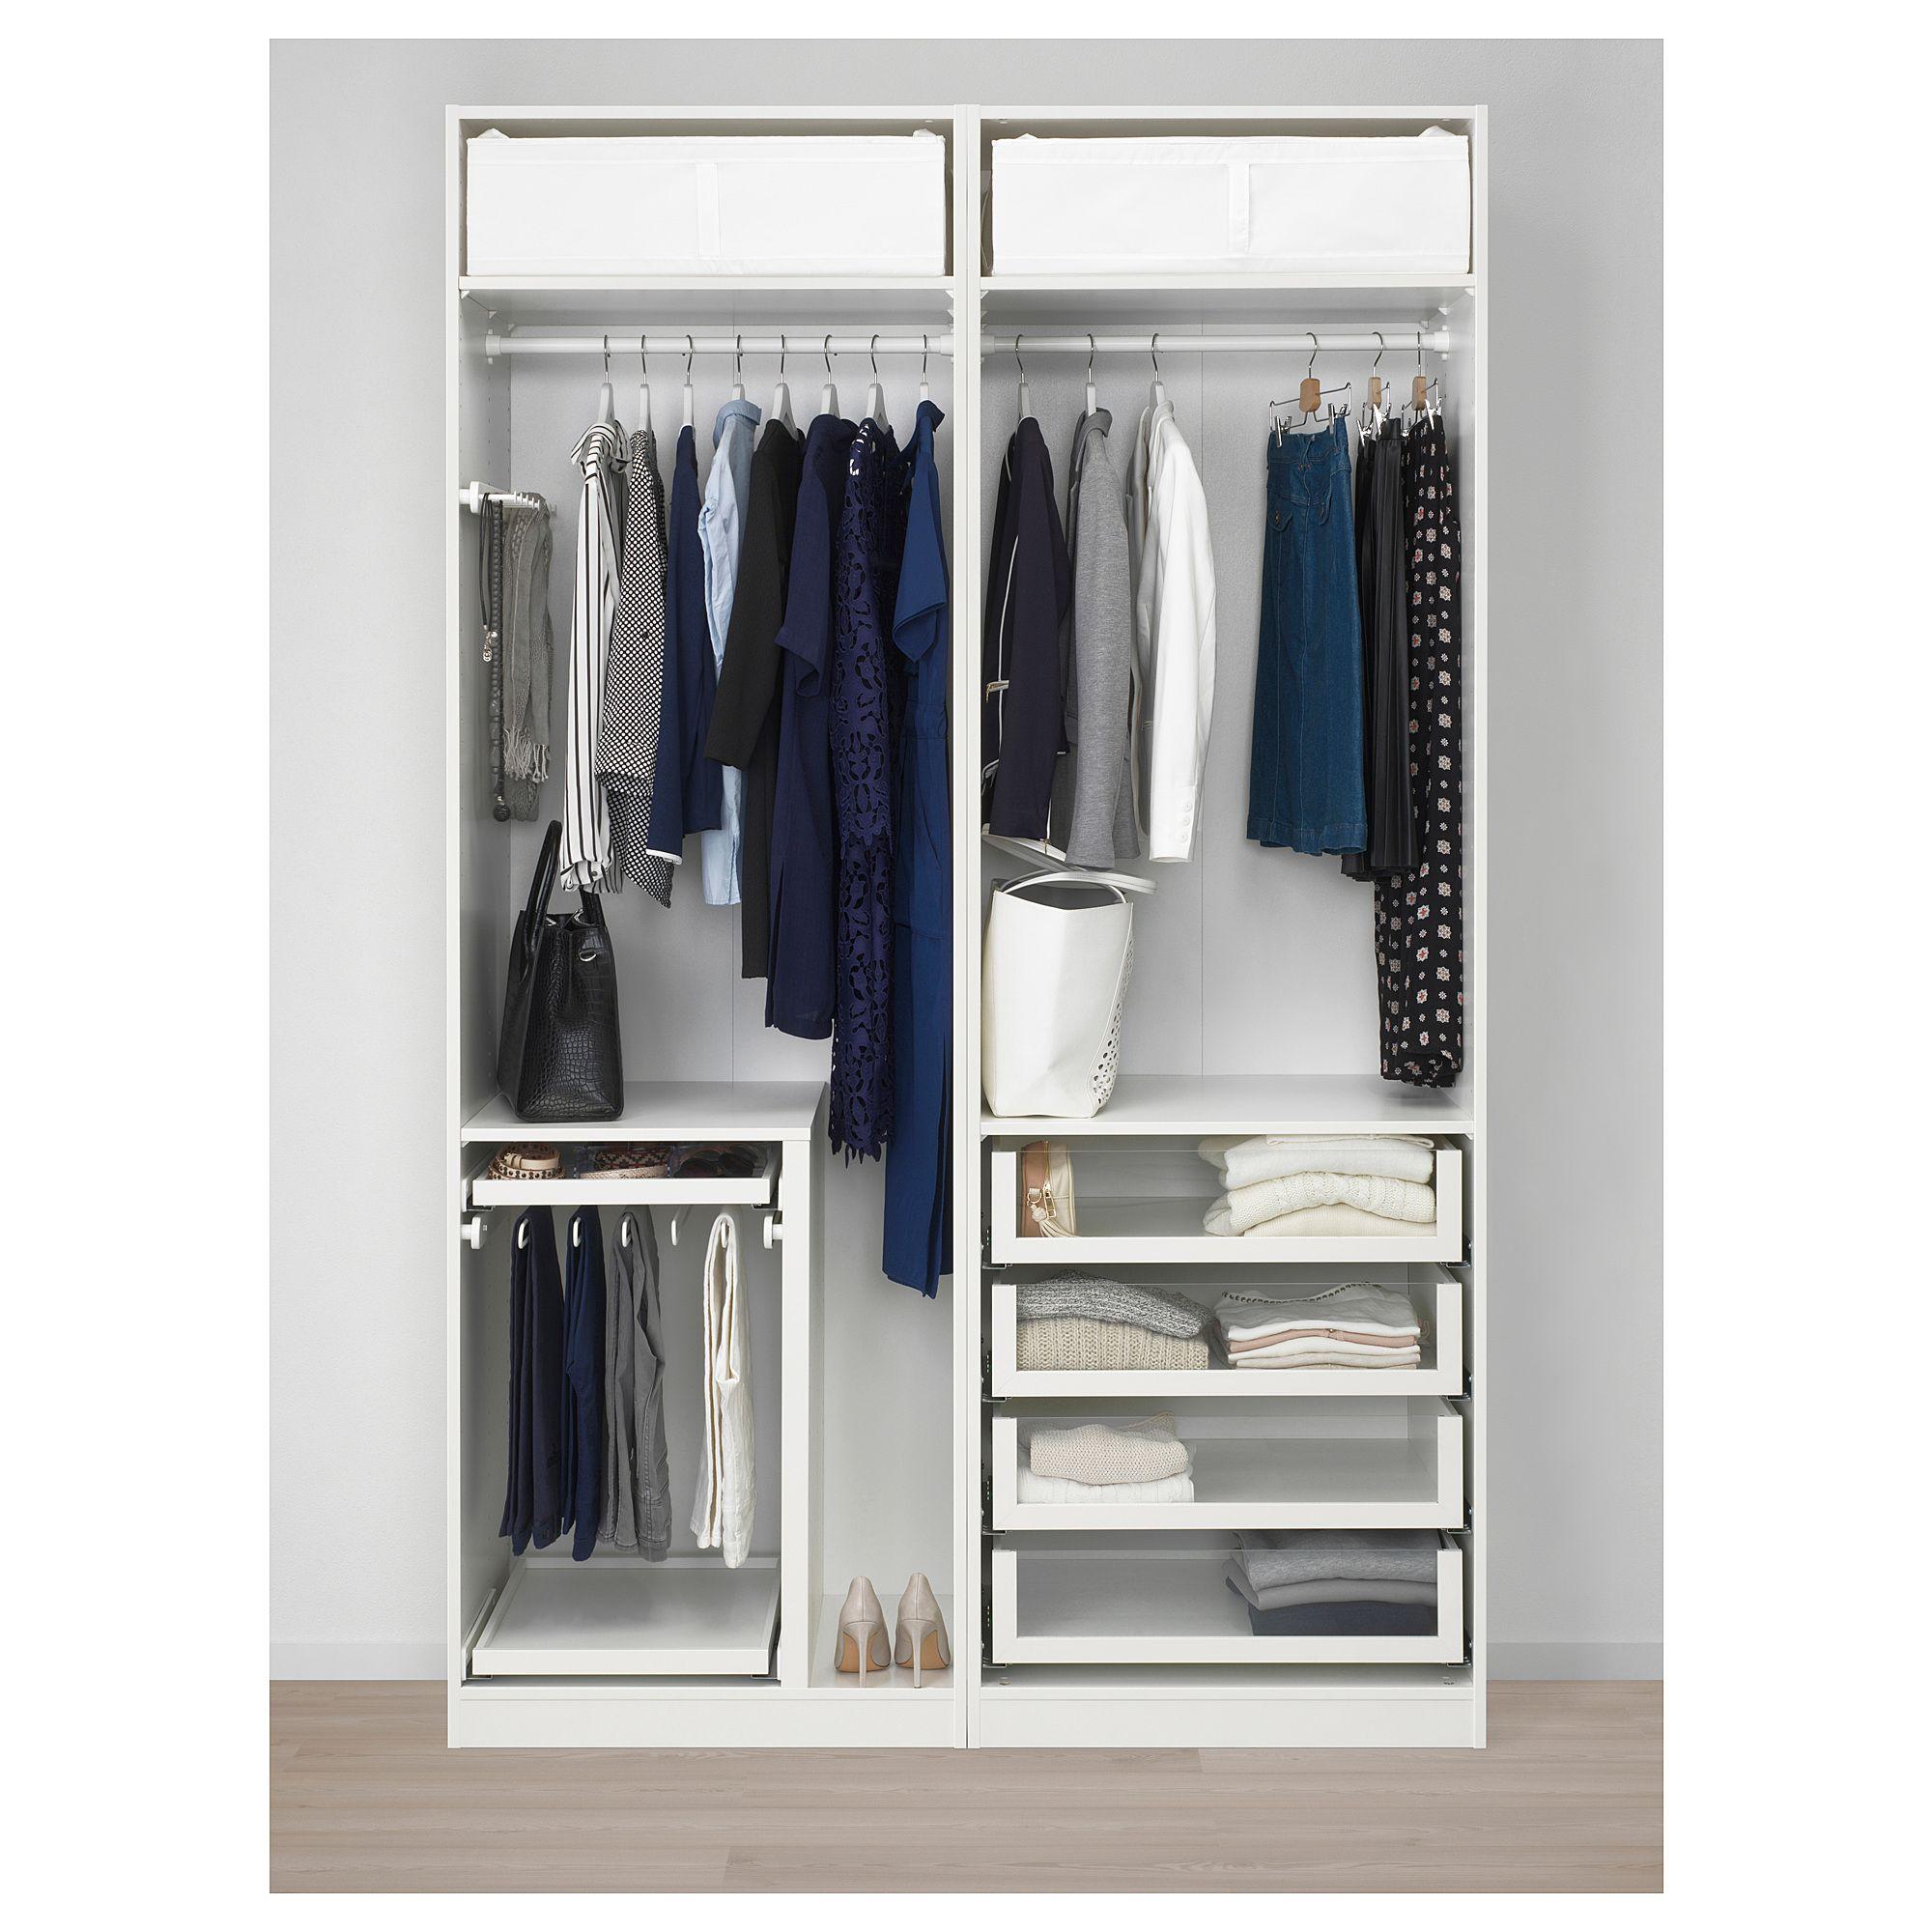 Furniture and Home Furnishings Ikea pax wardrobe, Pax